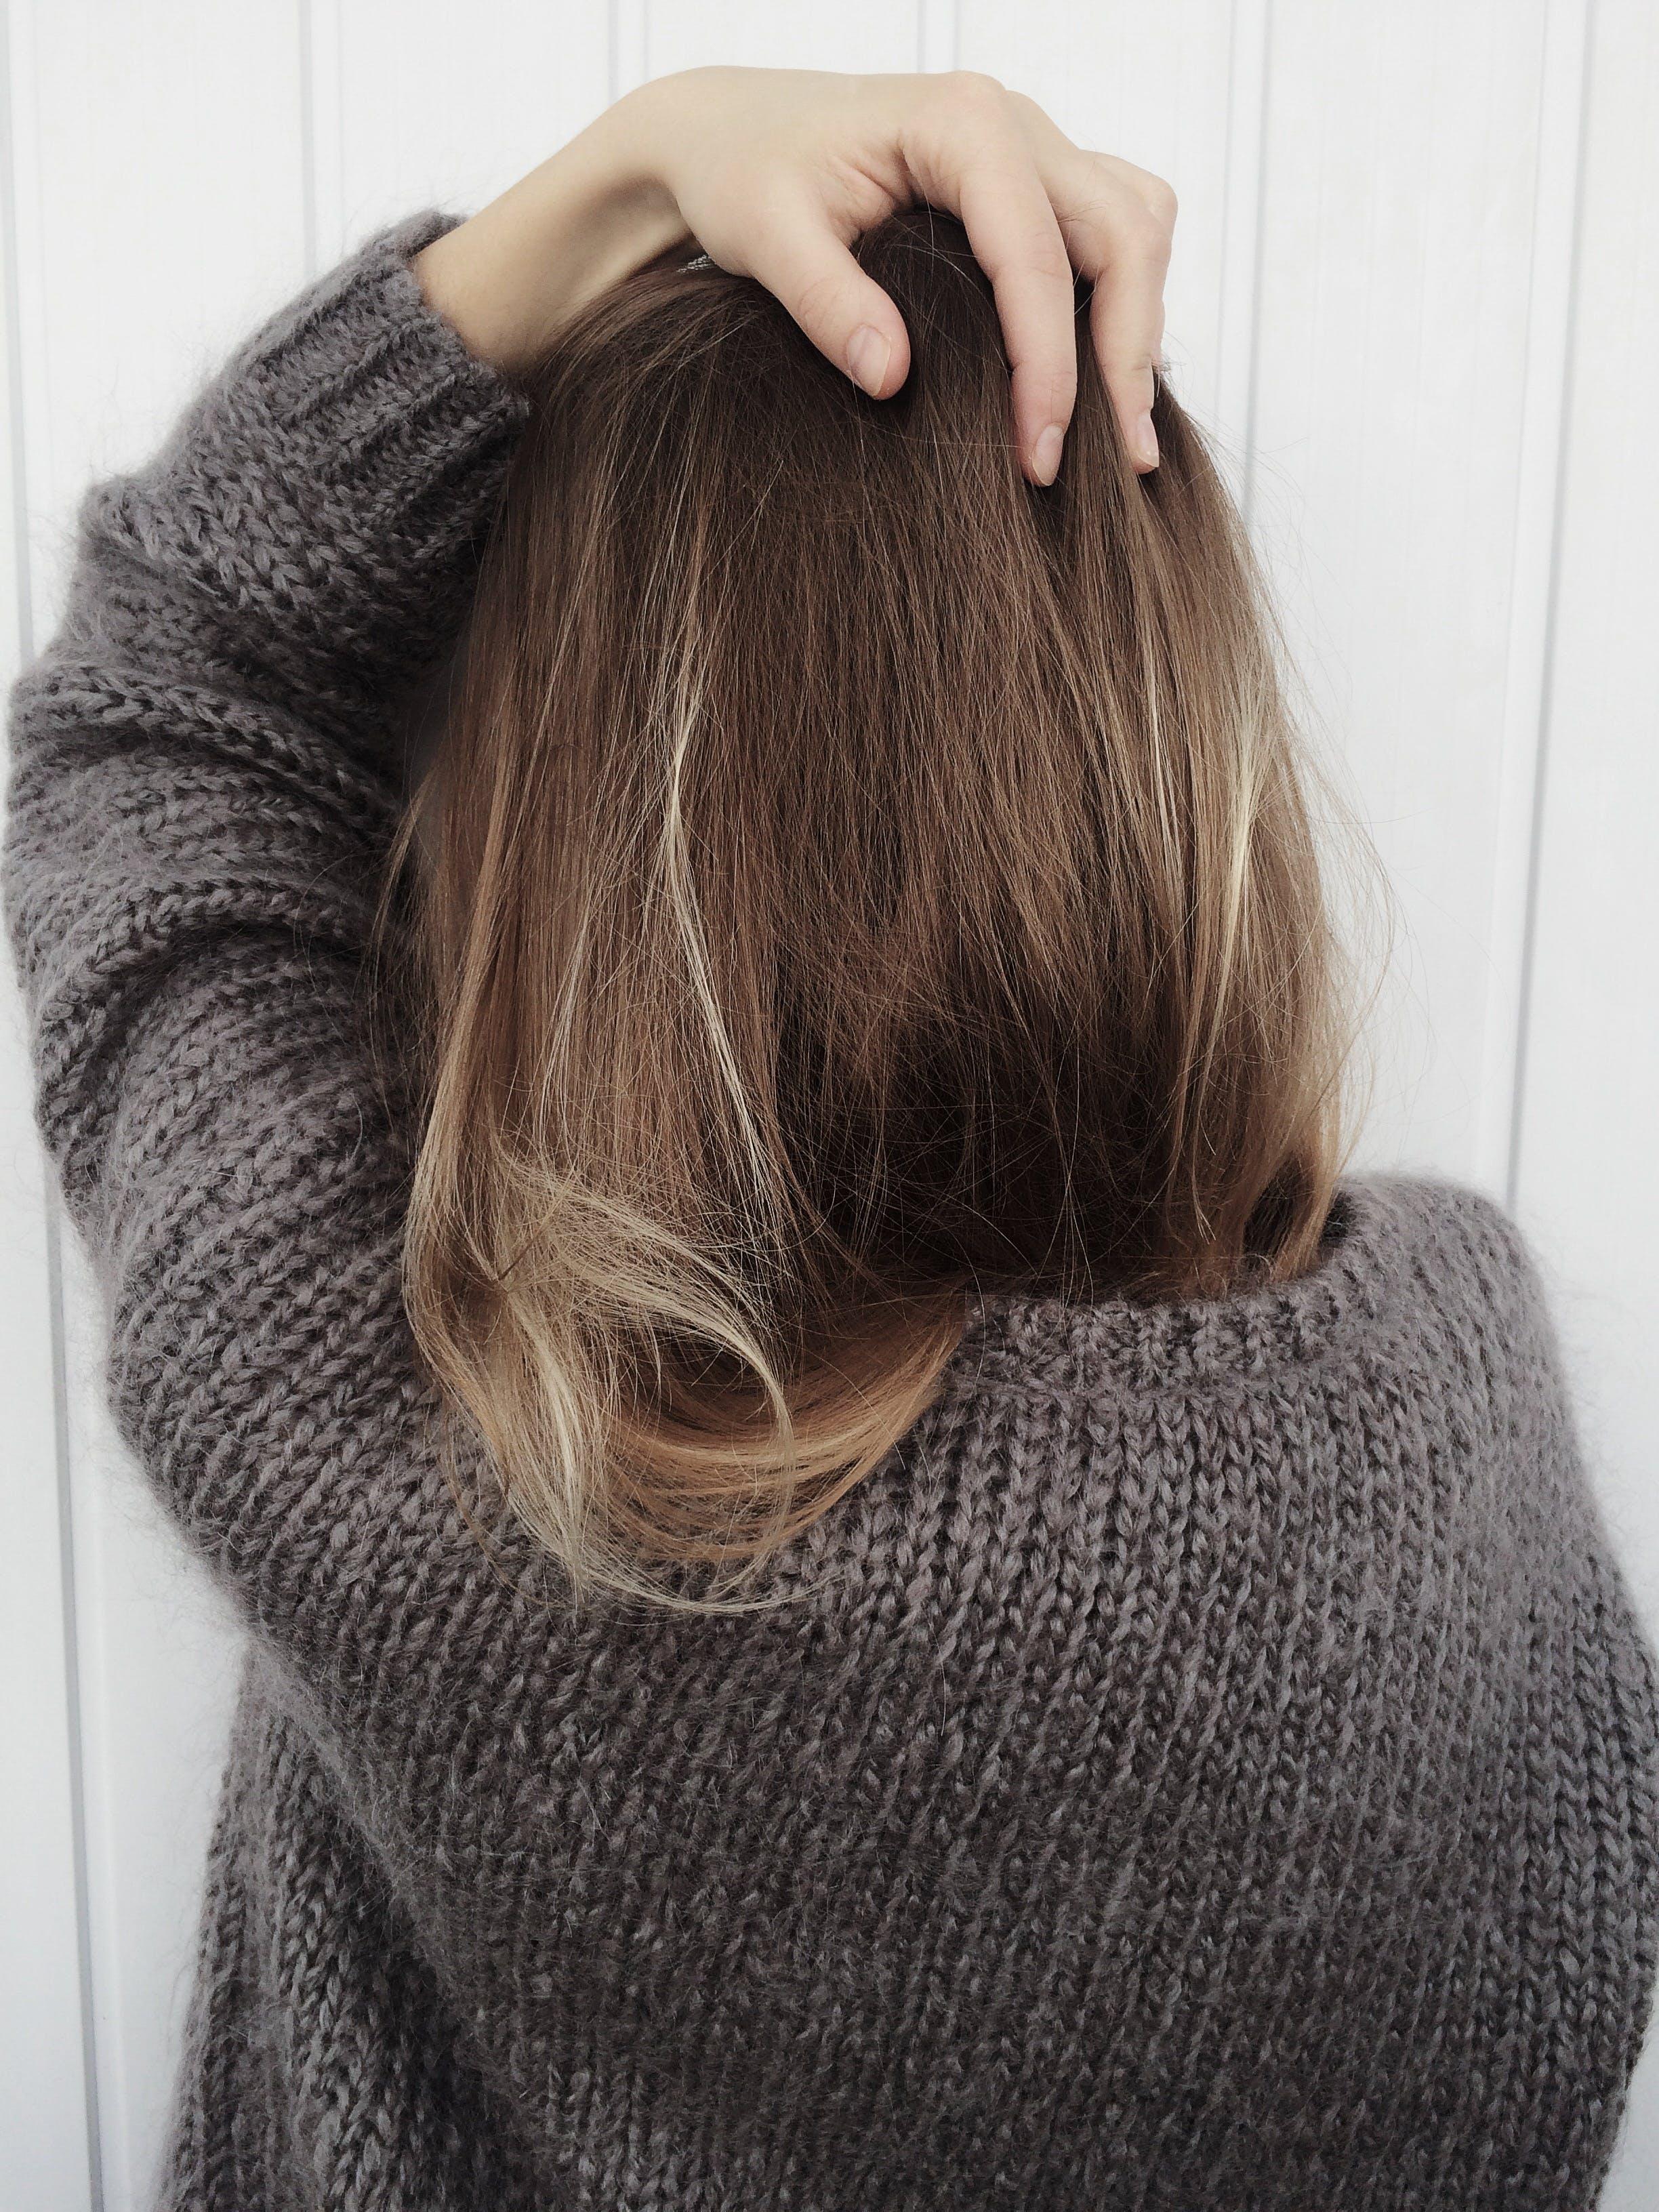 Fotos de stock gratuitas de adulto, cabello, jersei, mujer